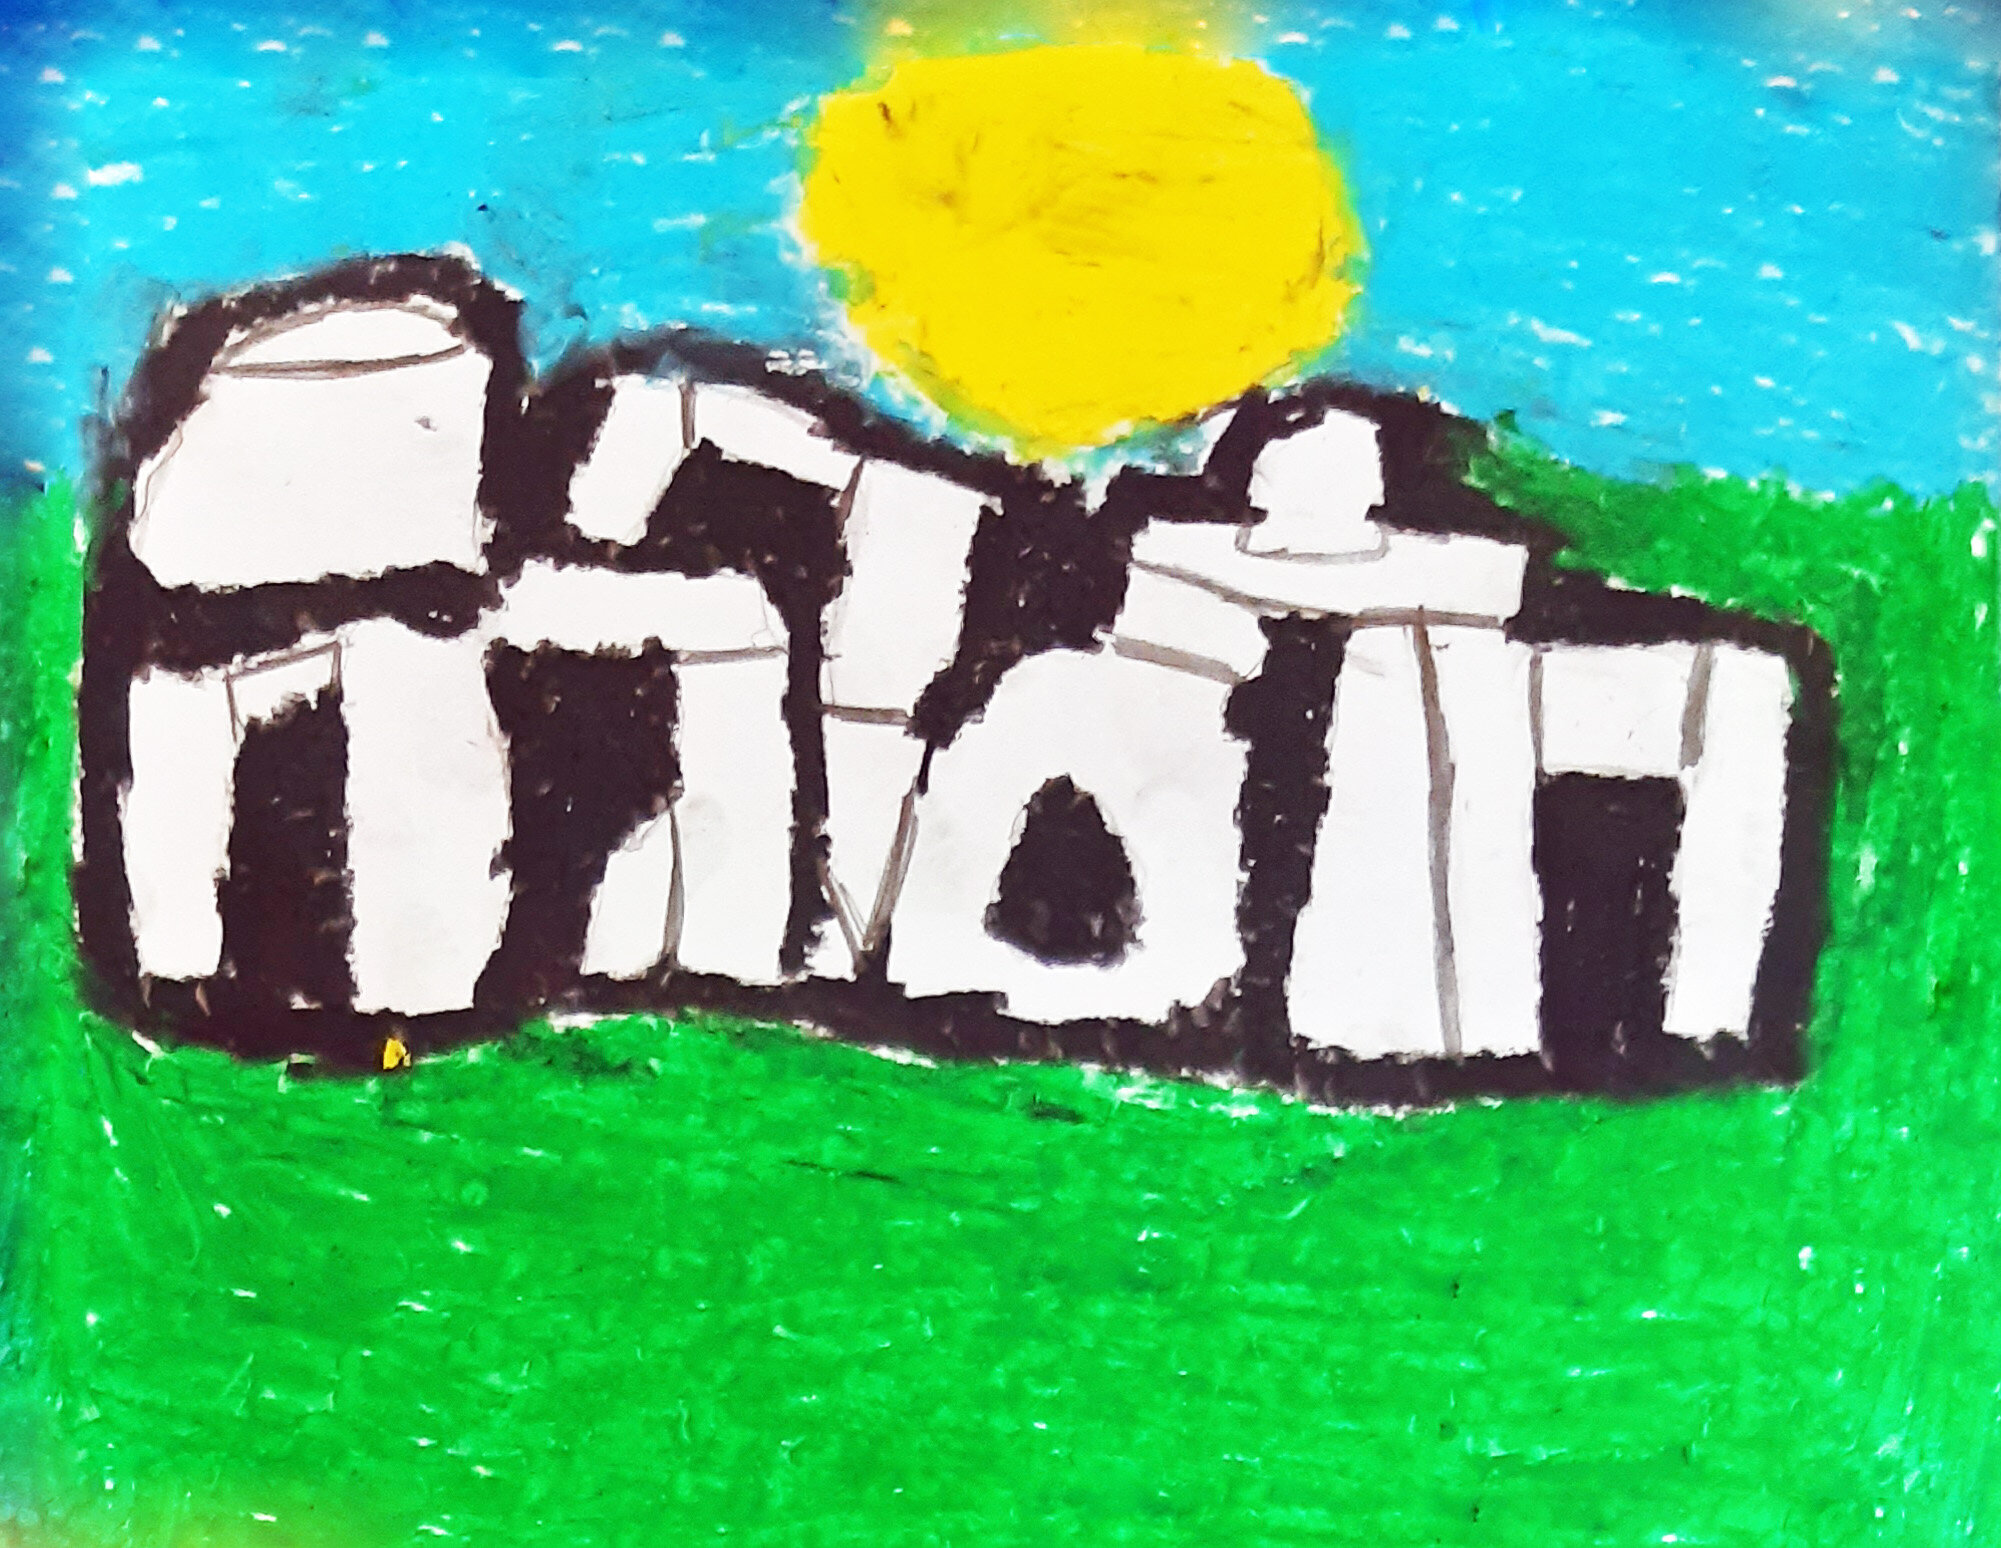 french-school-miami-stonehenge-megalith-art.jpg